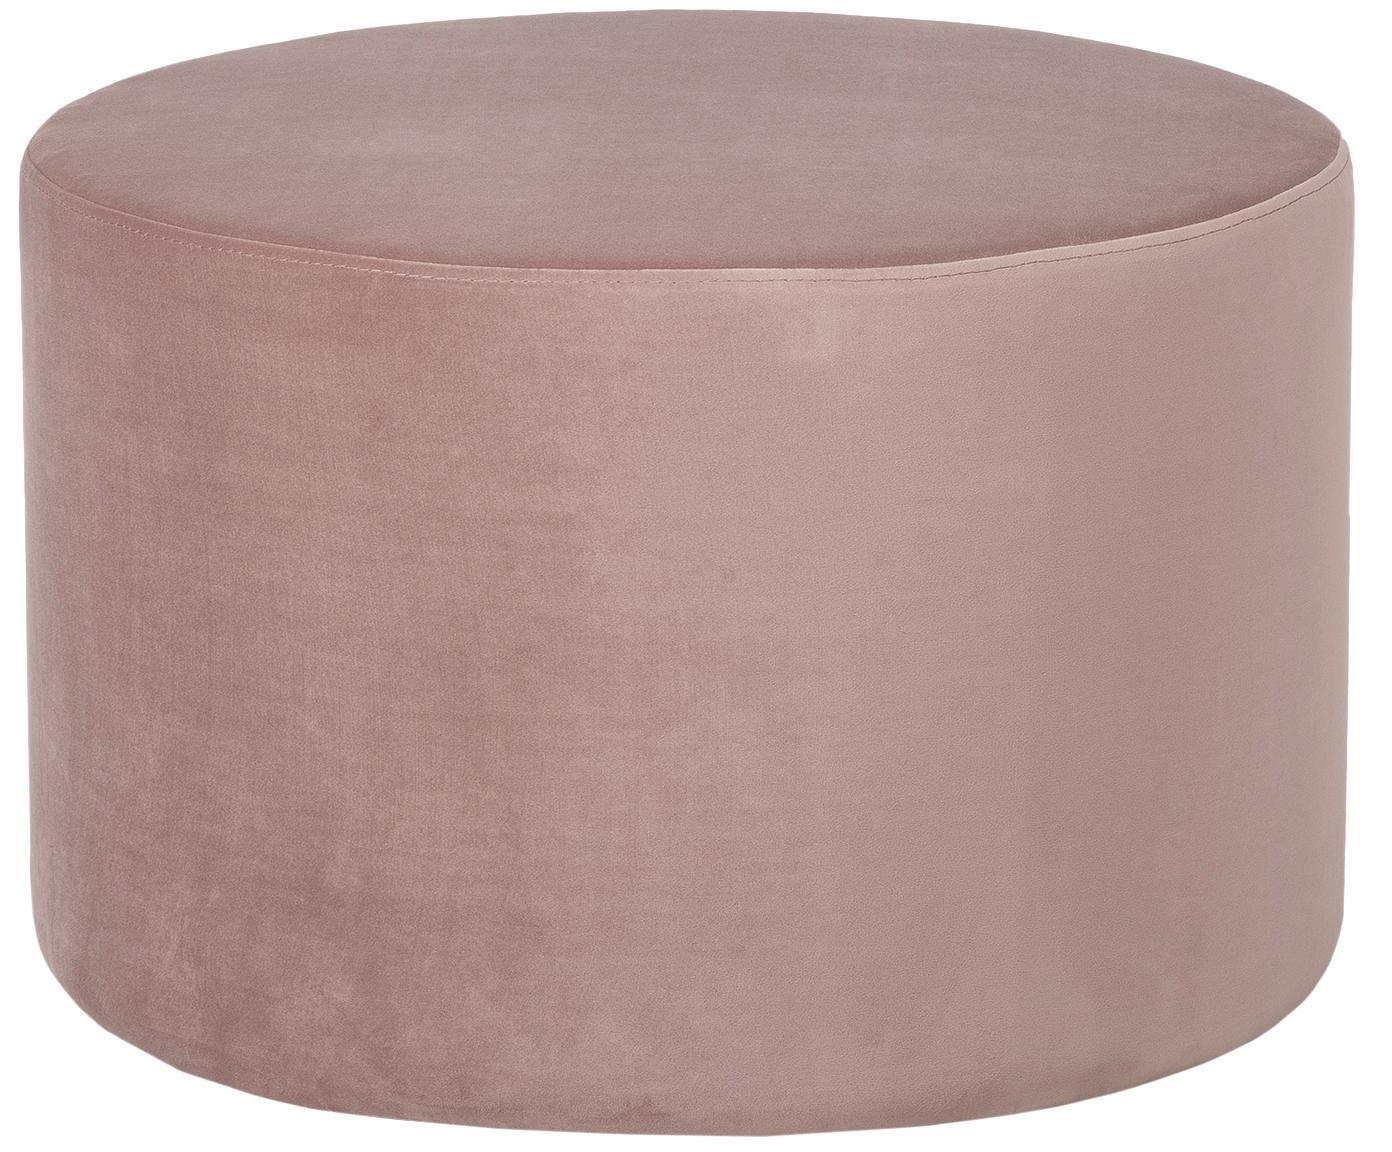 Samt-Hocker Daisy, Bezug: Samt (Polyester) 15.000 S, Rahmen: Mitteldichte Holzfaserpla, Rosa, Ø 60 x H 41 cm